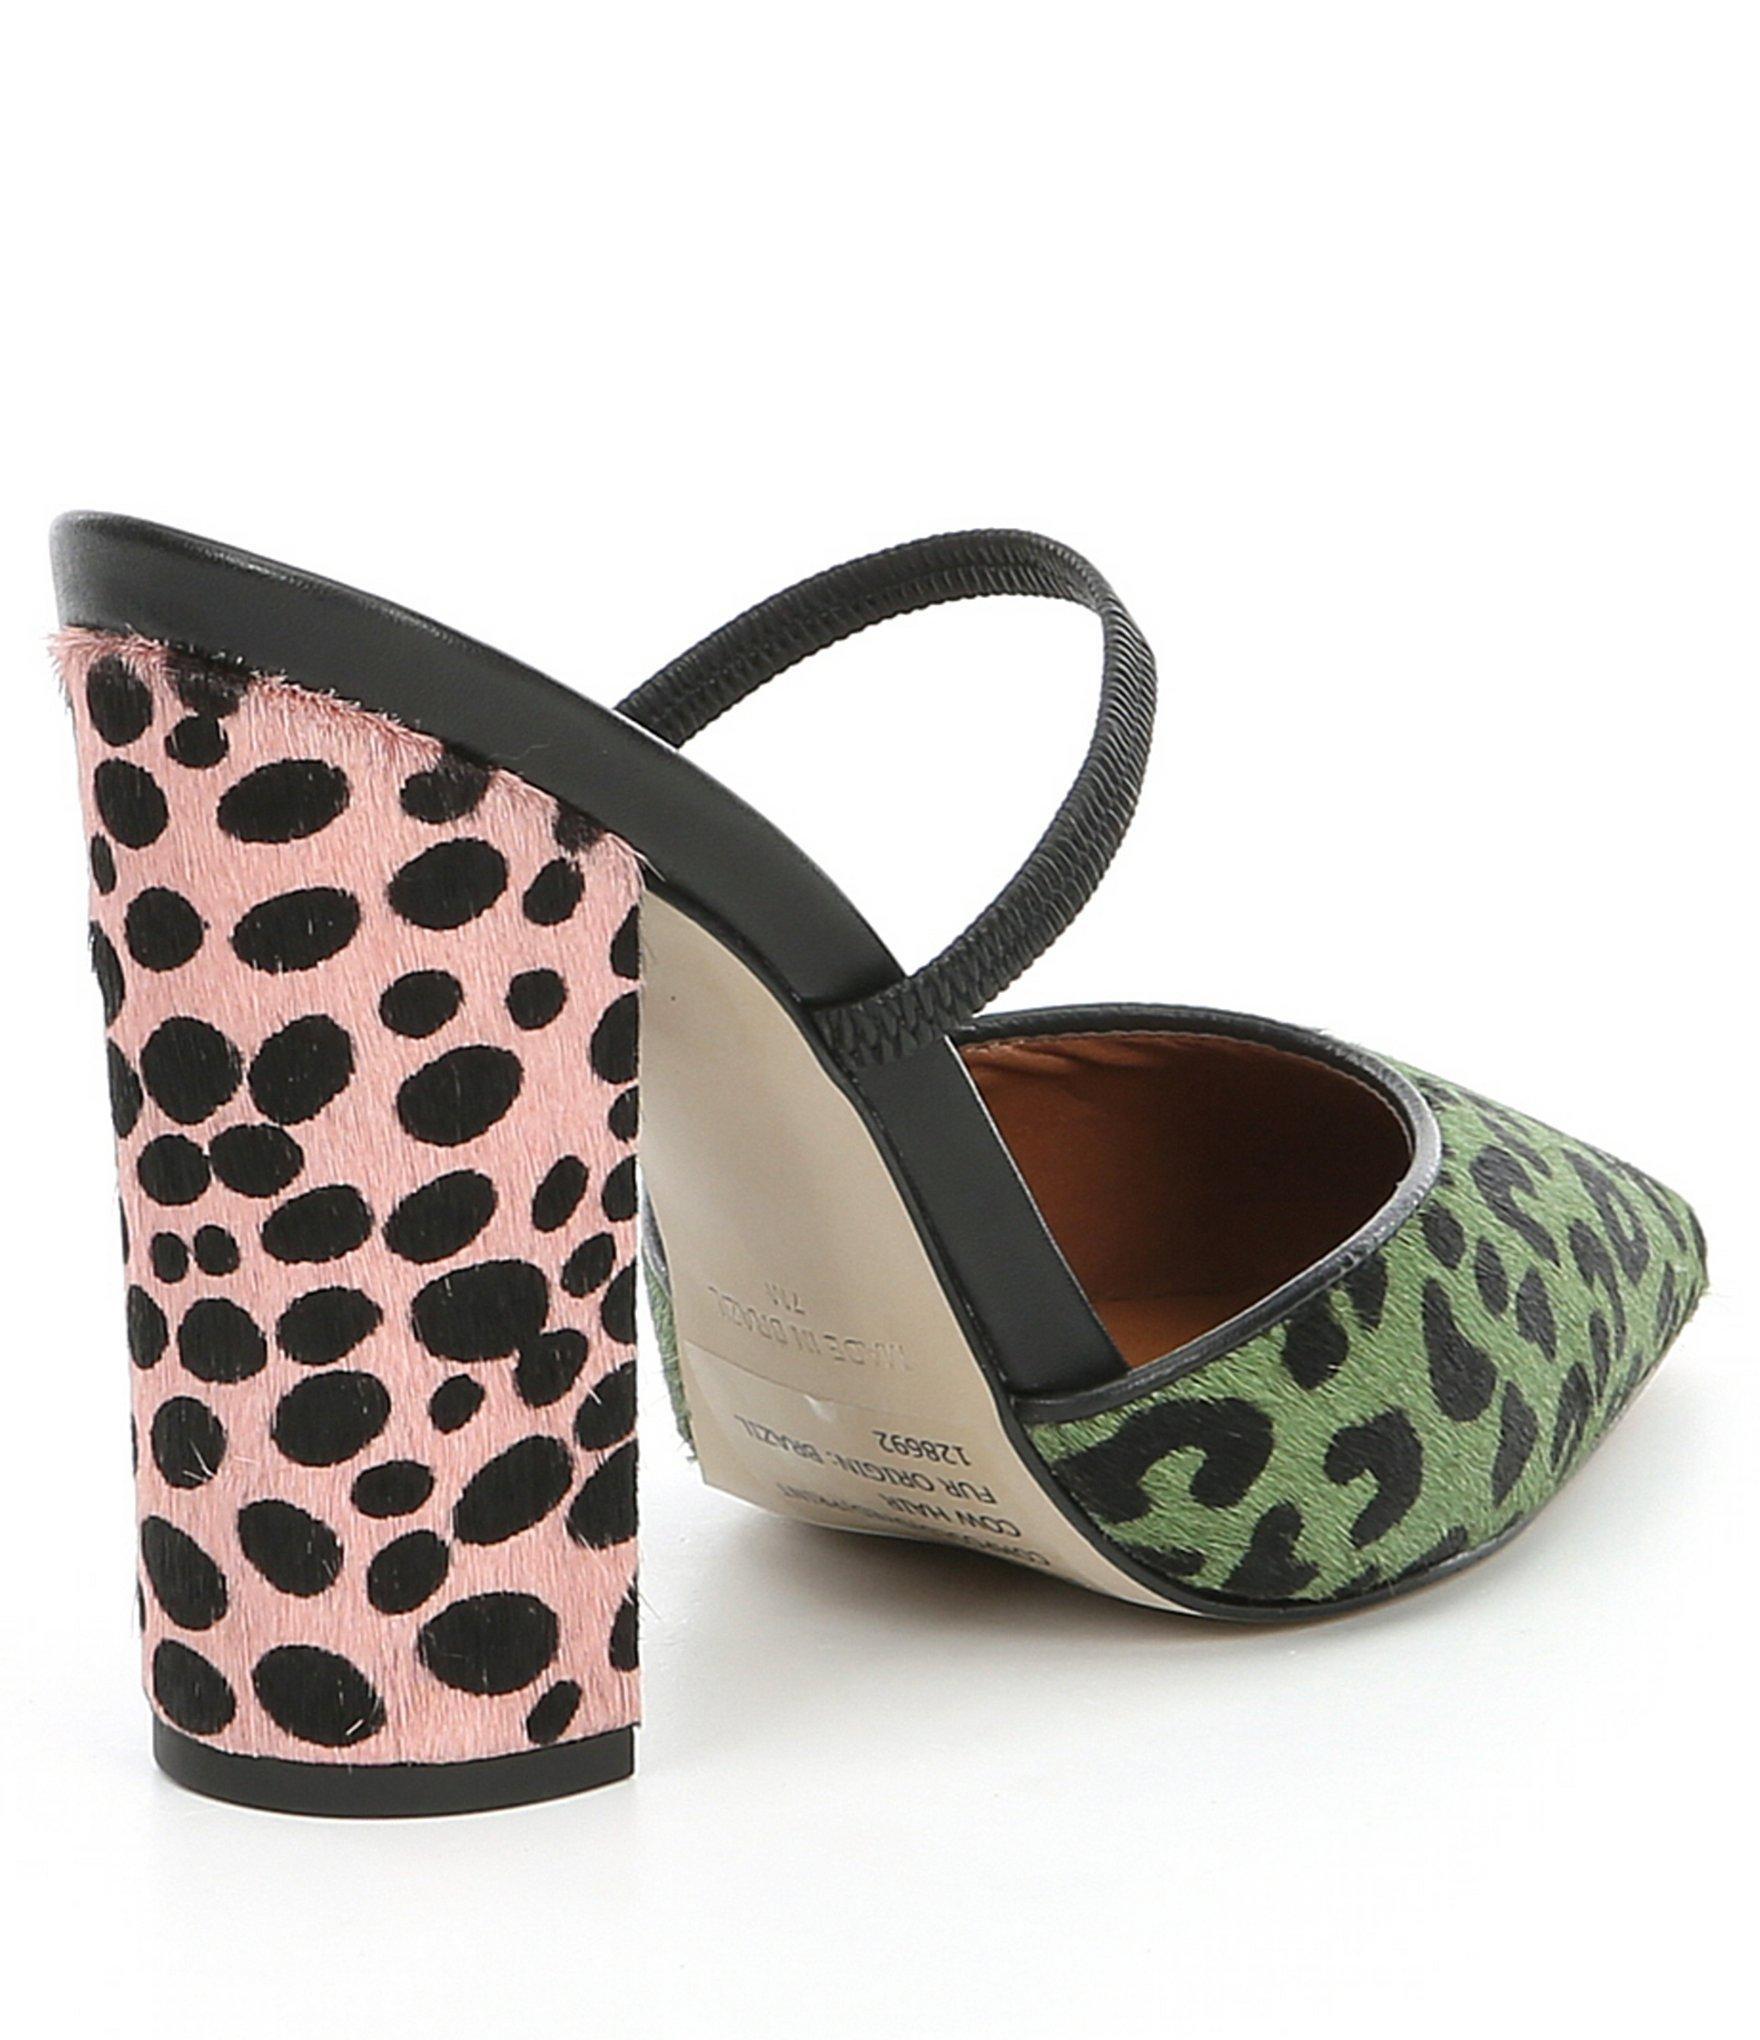 2cdc53107b2 Women's Peaked-l Haircalf Leopard Block-heel Pumps